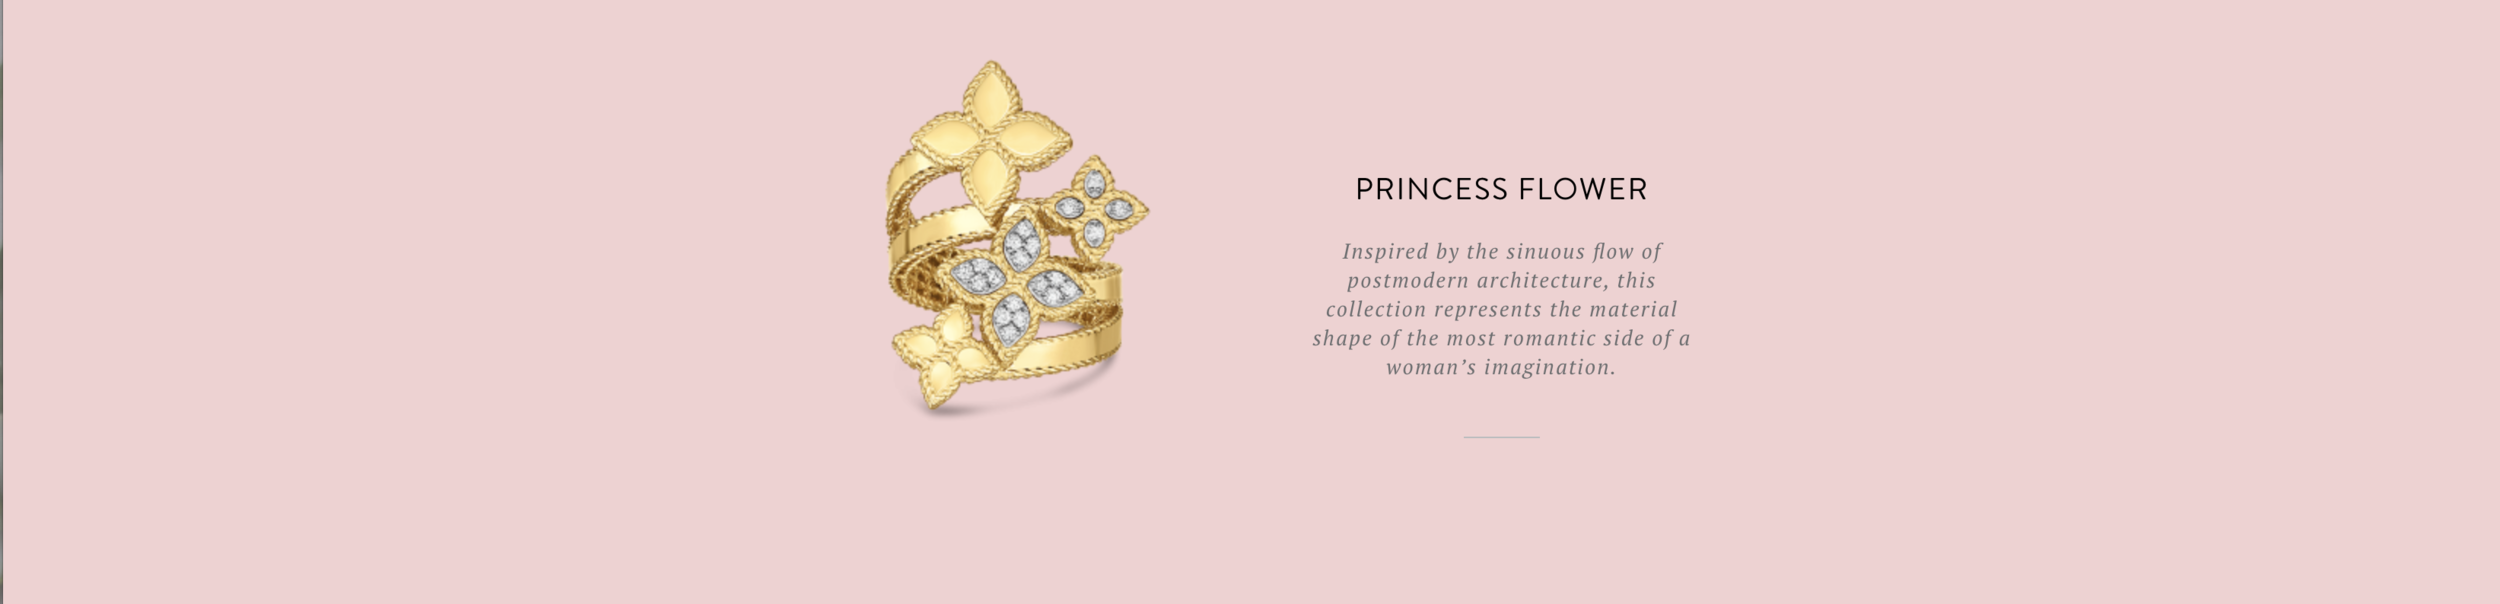 Princess Flower Roberto Coin at Providence Diamond.